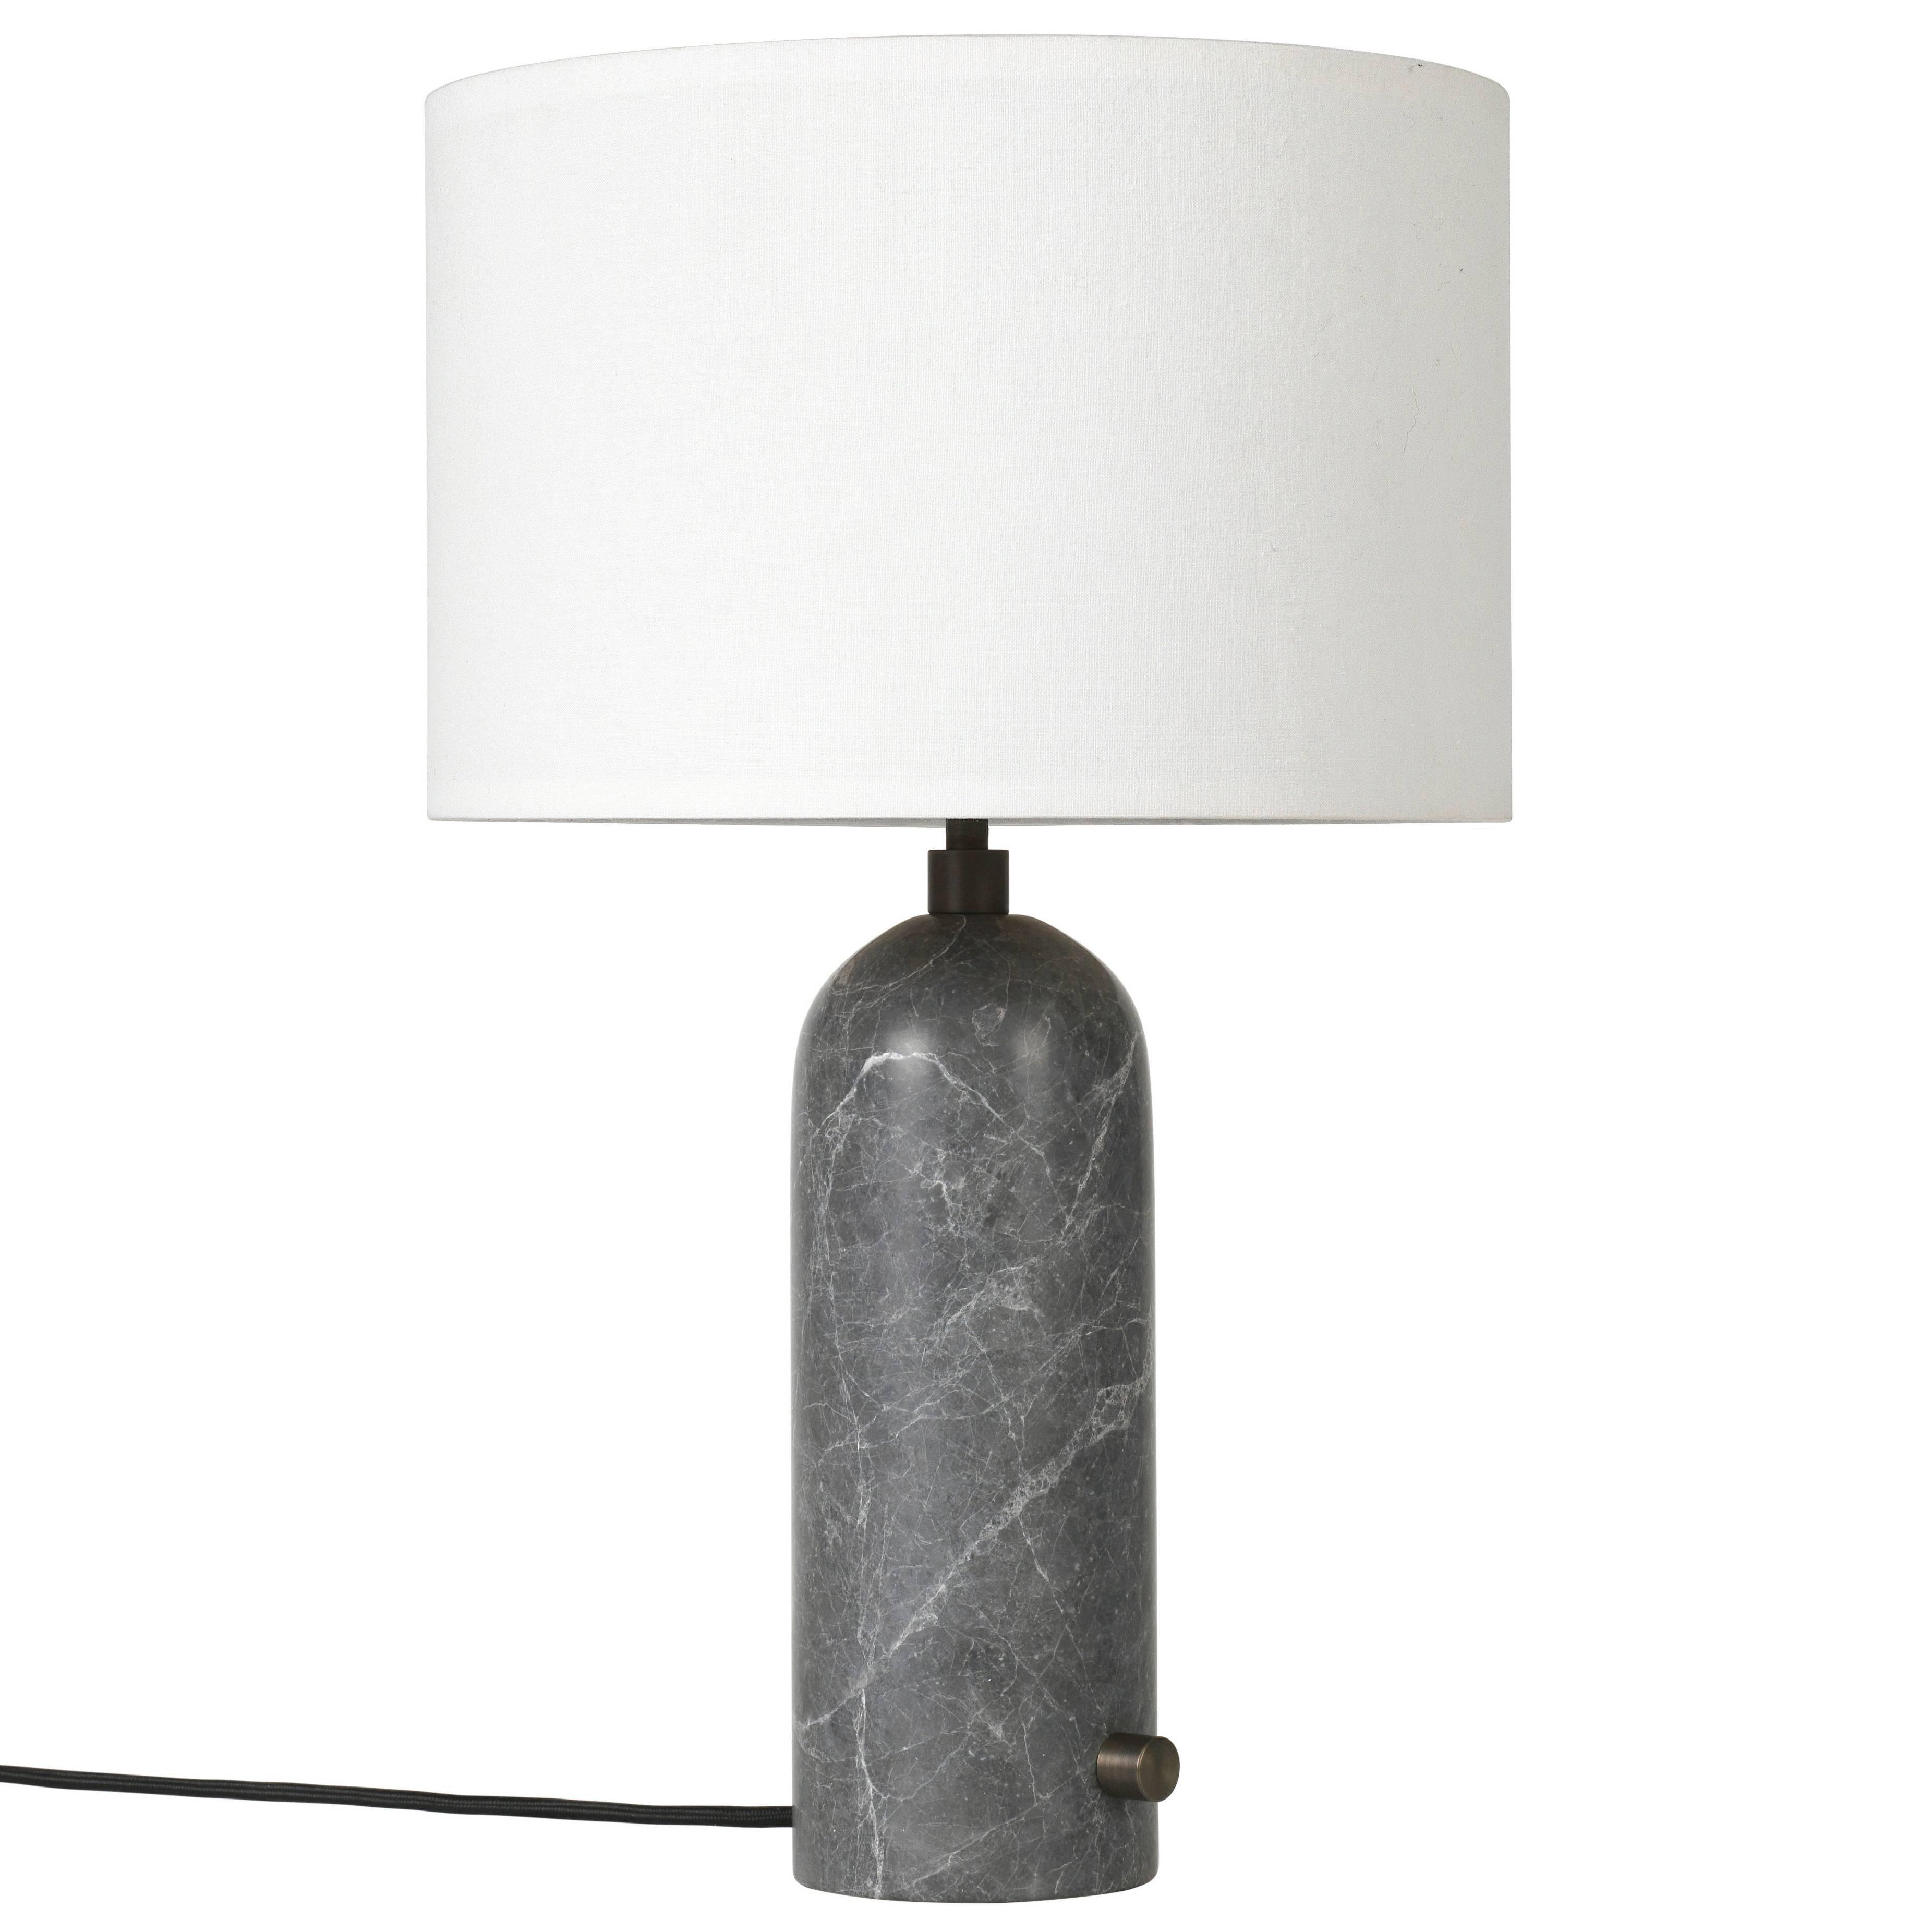 U0027Gravityu0027 Grey Marble Table Lamp For Sale. U0027